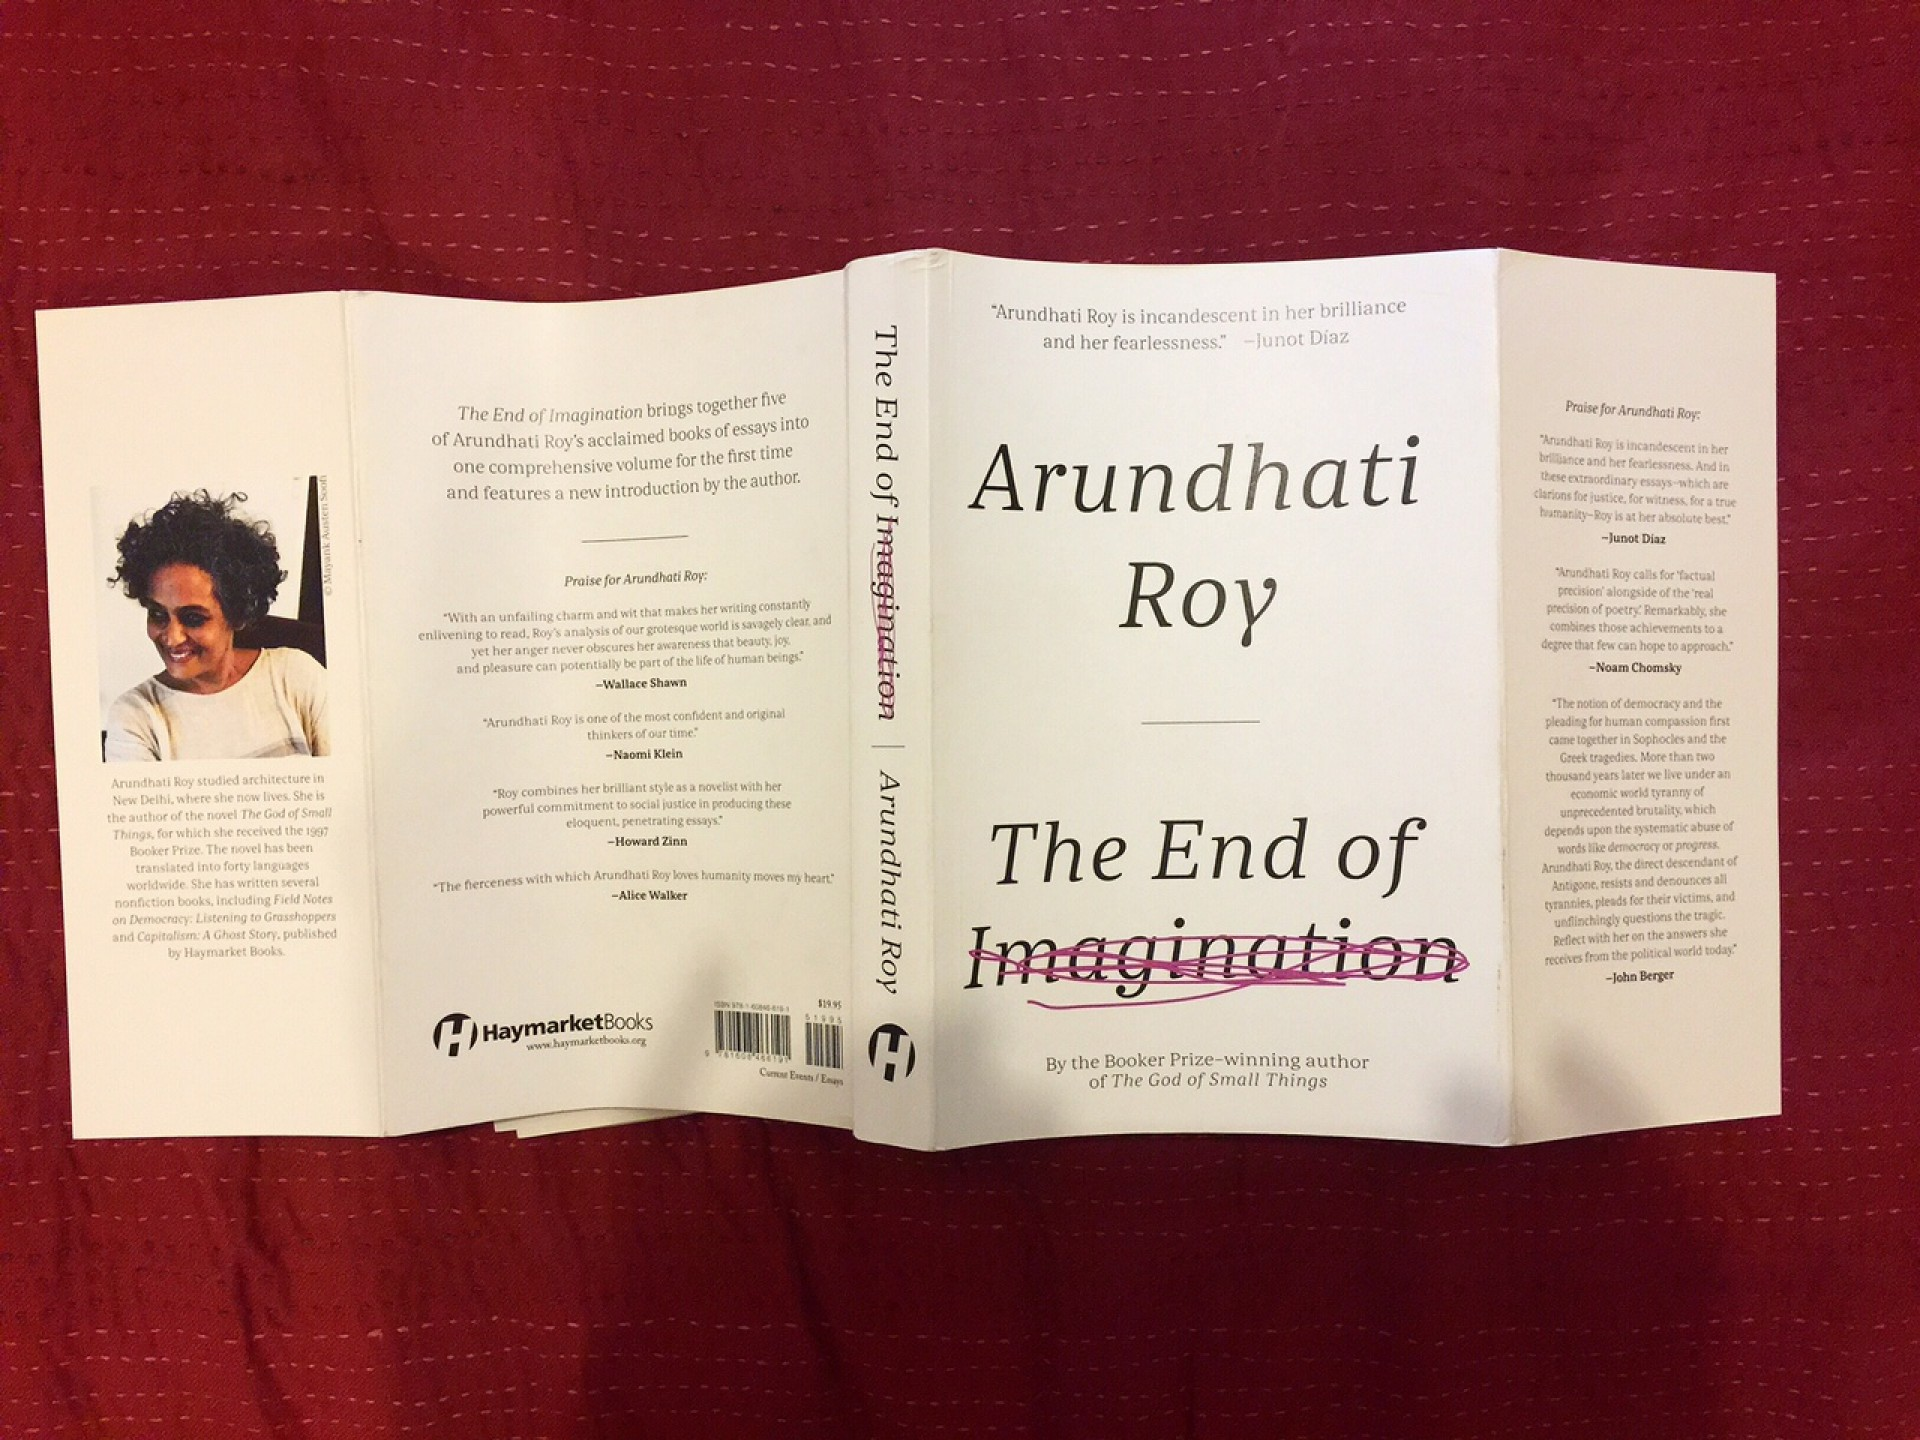 011 Essays By Arundhati Roy Img 3699 Essay Sensational 1920